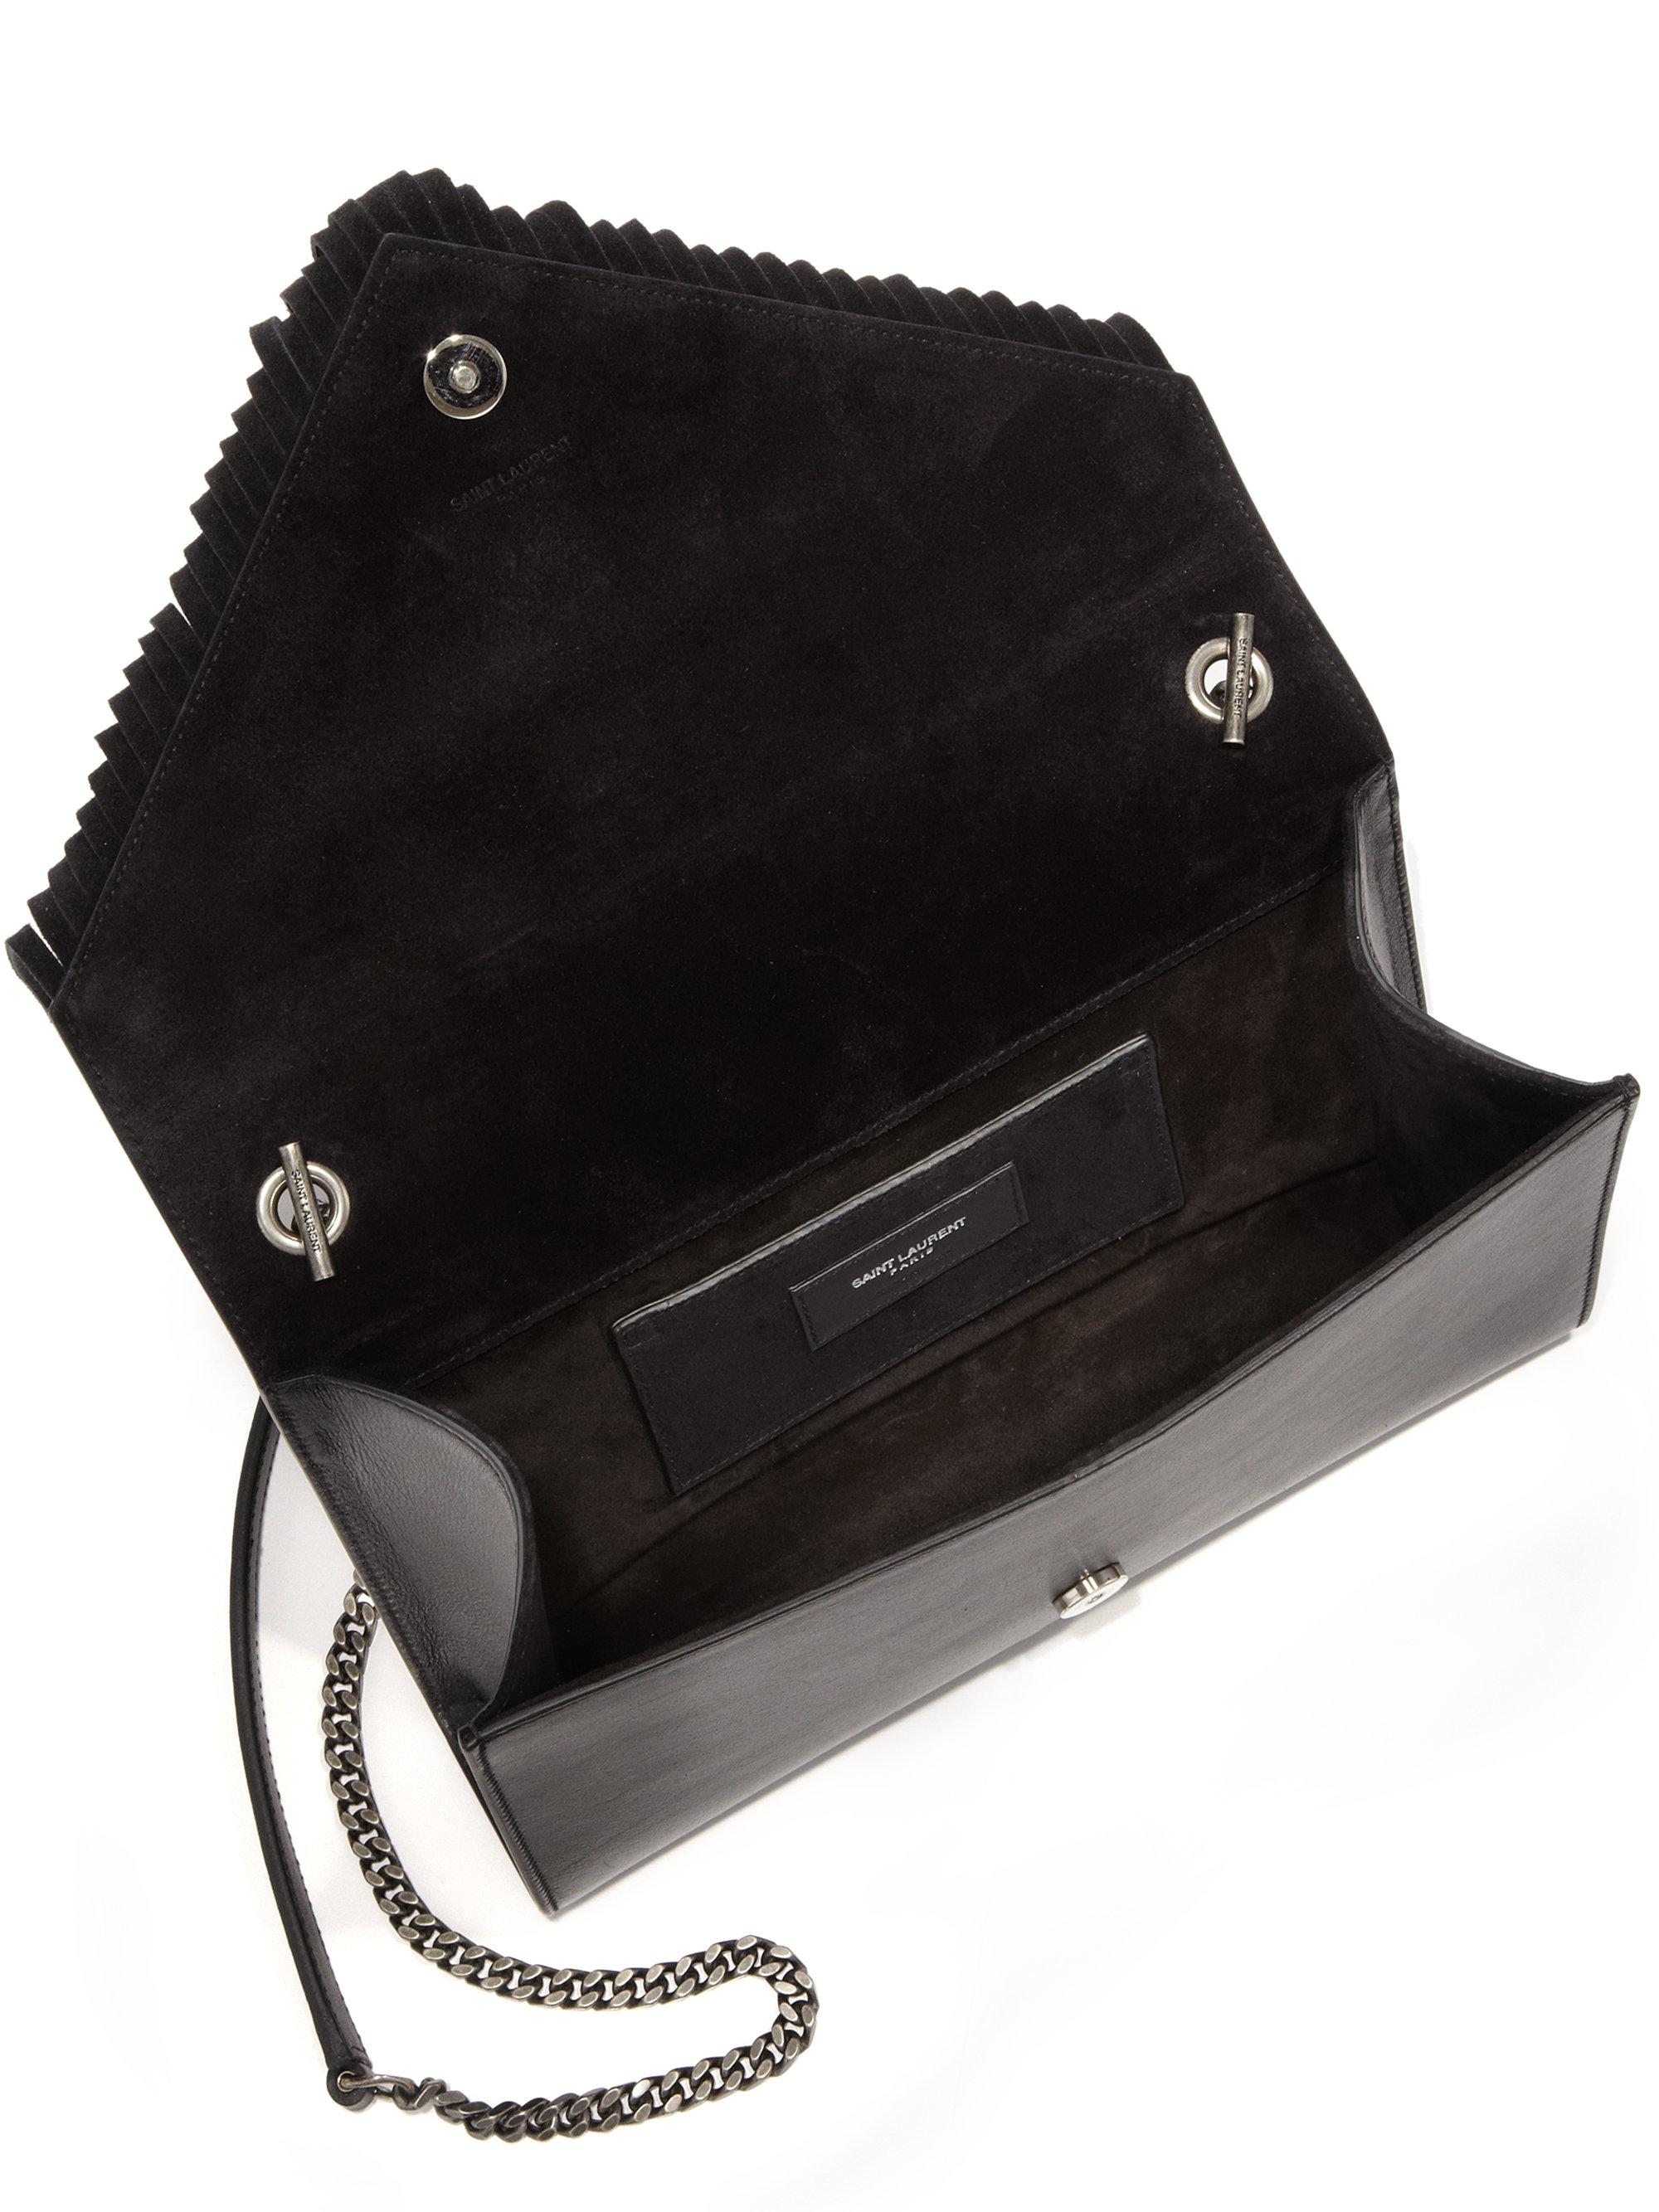 huge purse - monogram college medium shoulder bag, gray/white